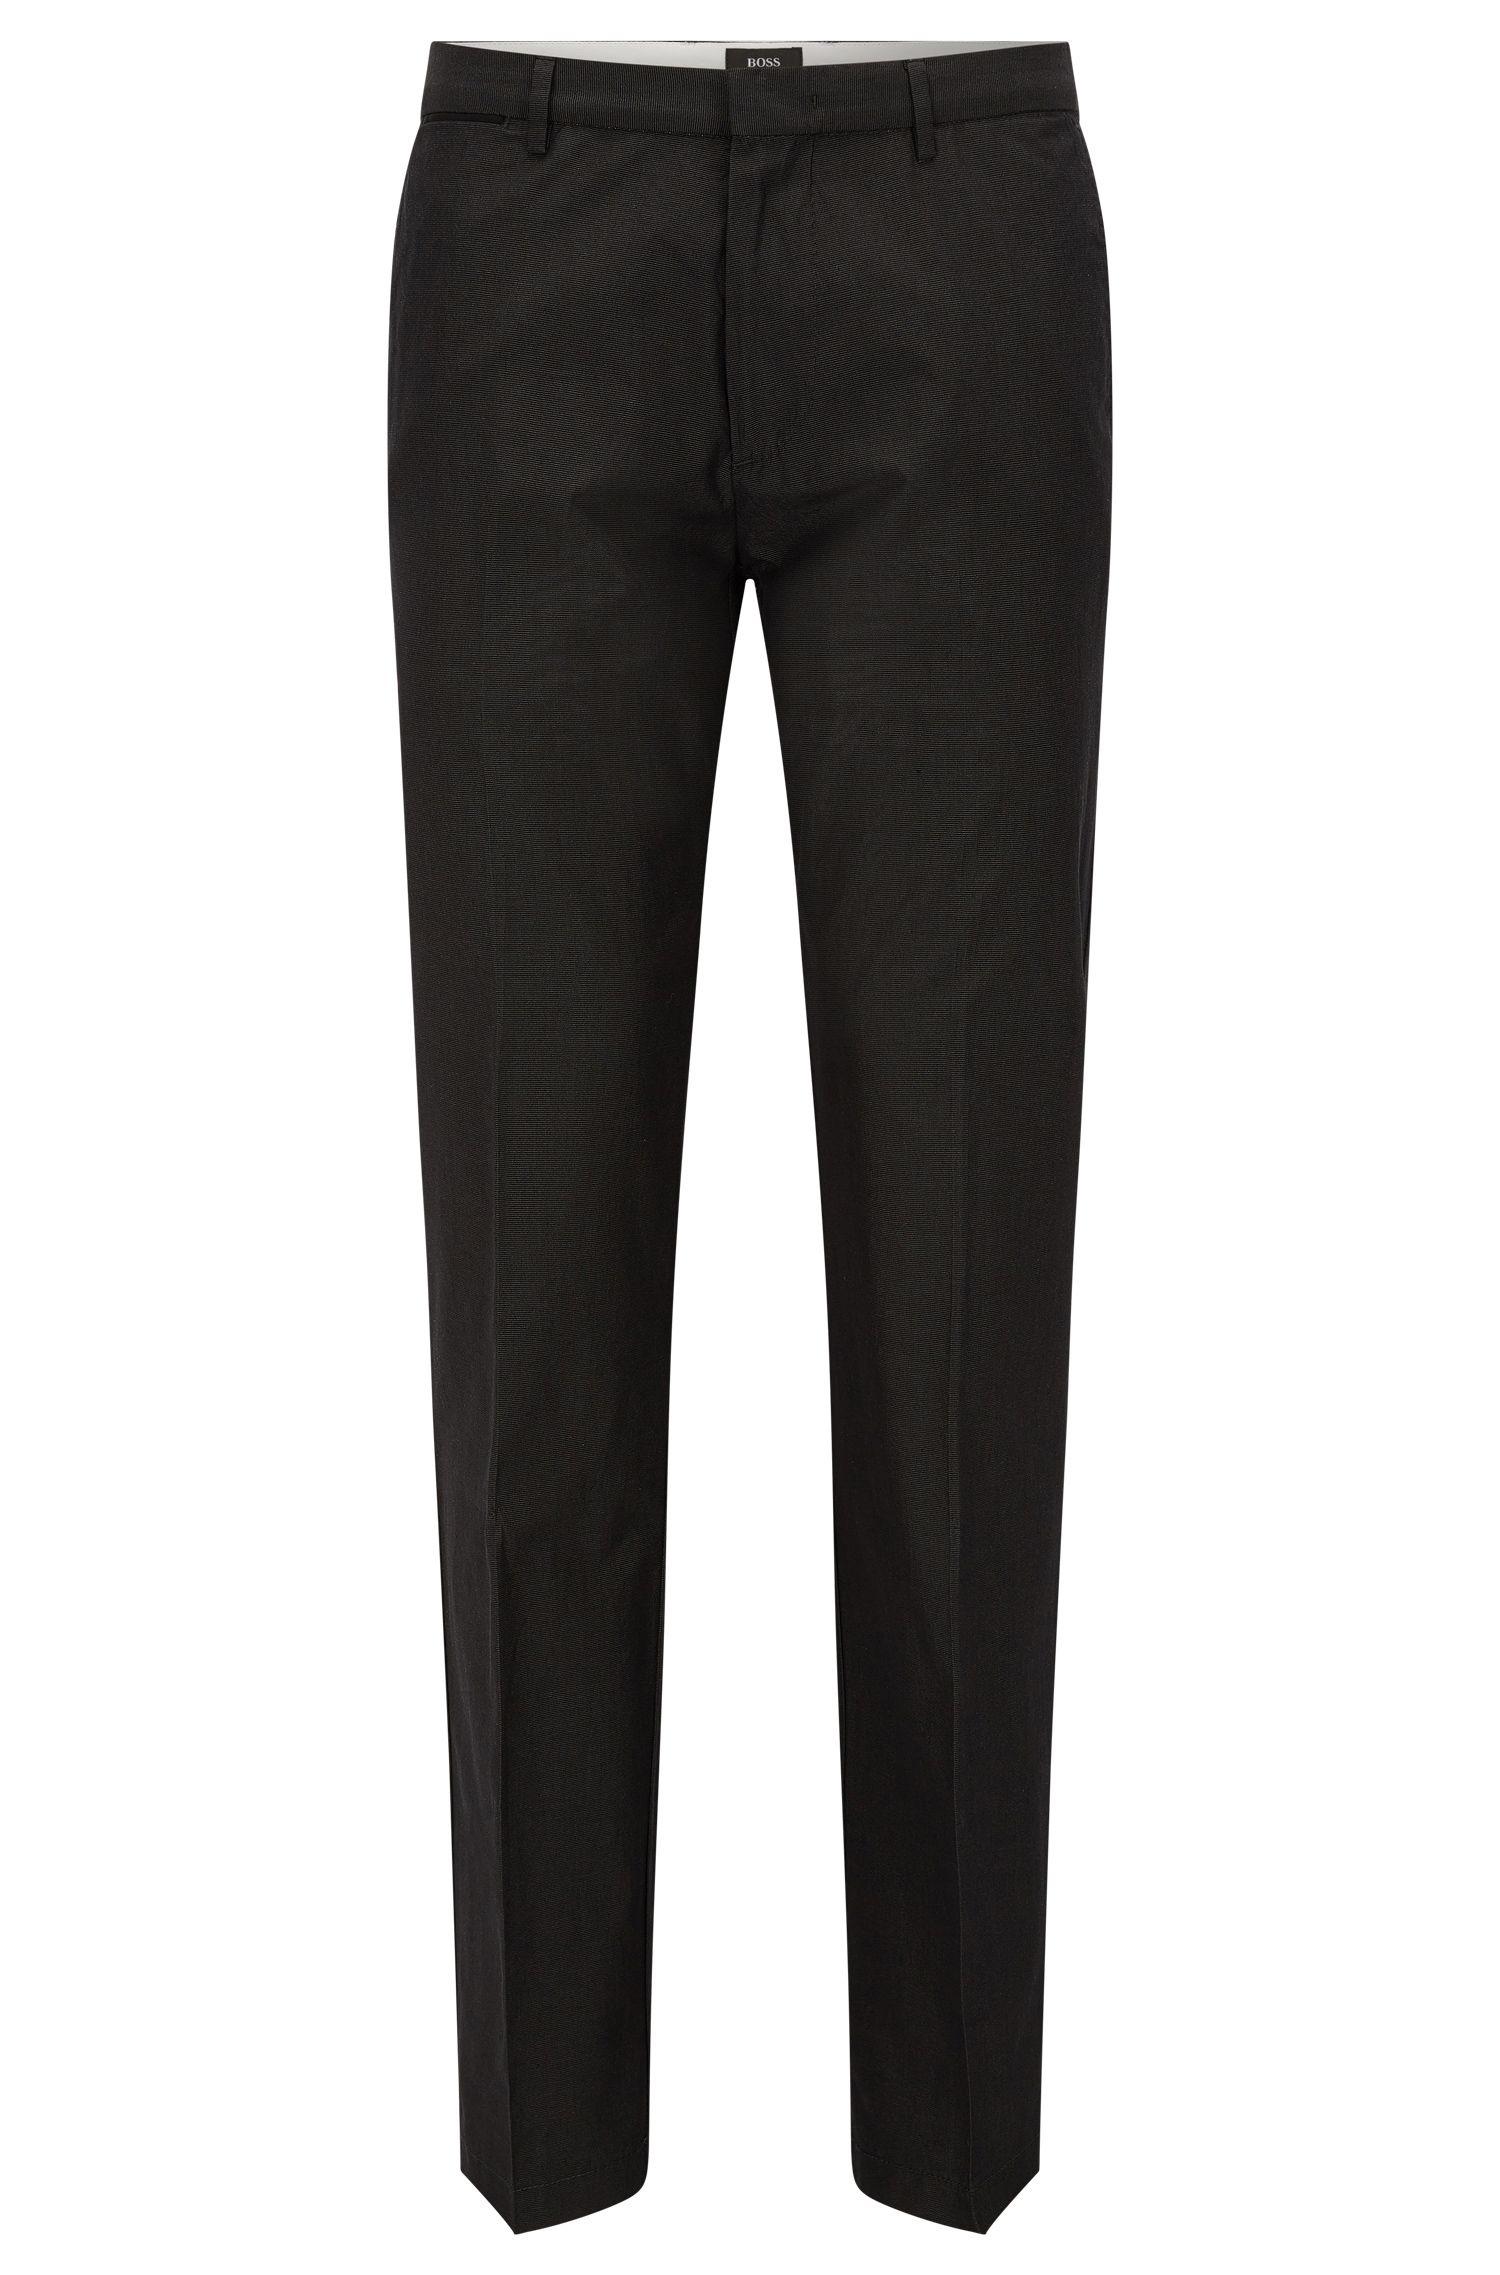 Cotton-Silk Pant, Regular Fit | Crigan Luxe W, Dark Grey